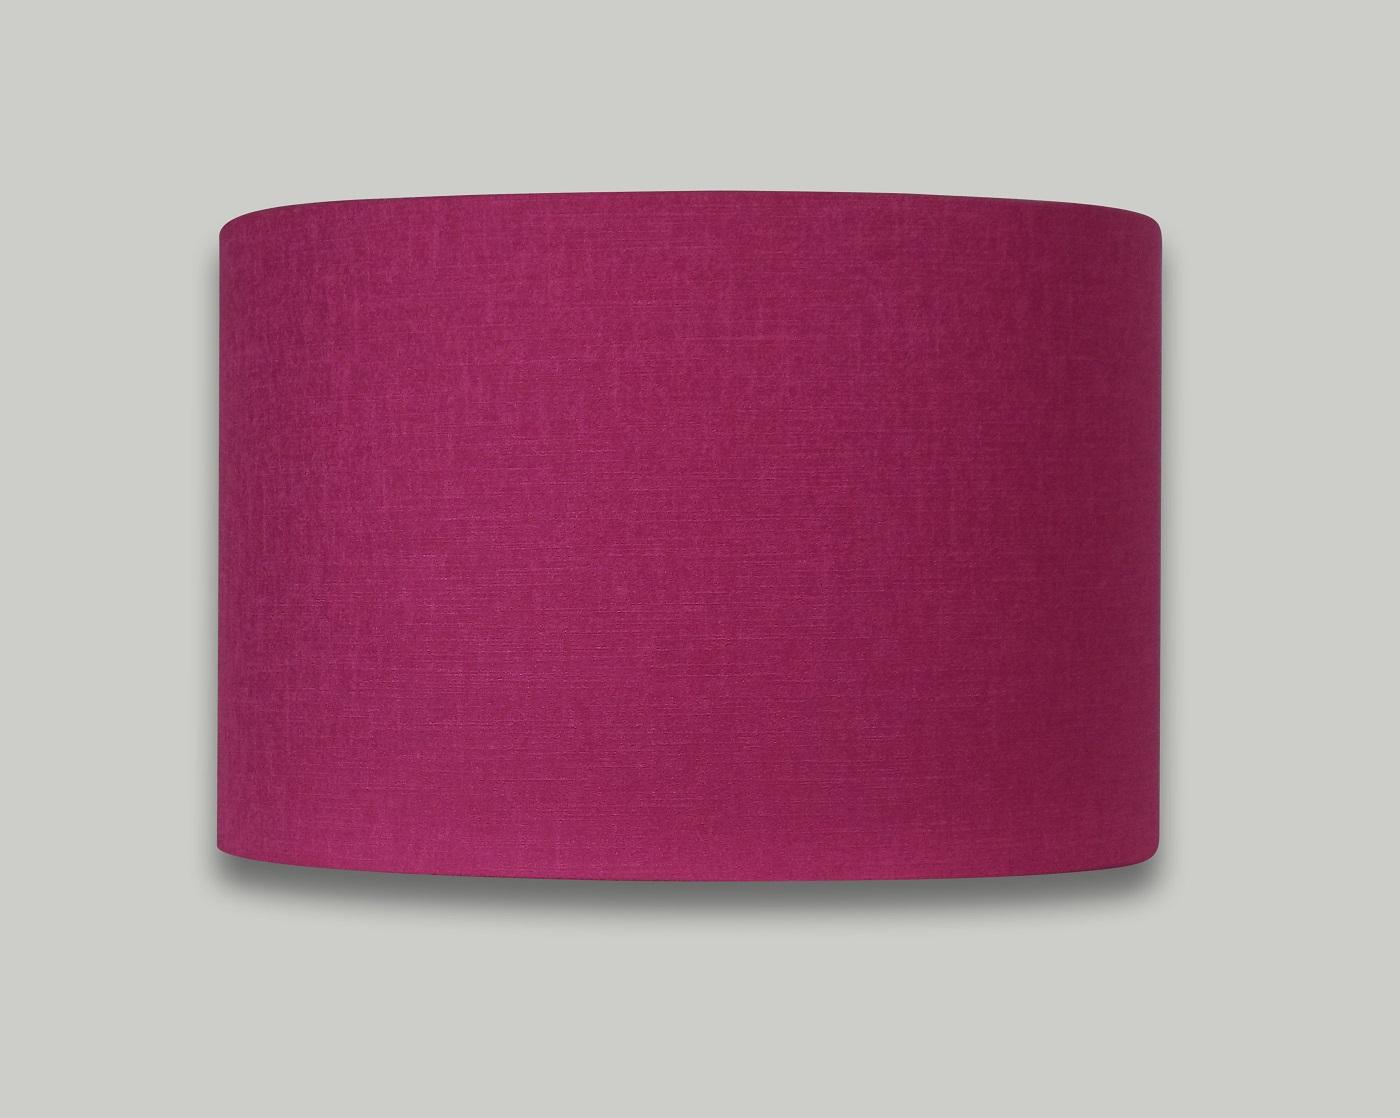 Fresh Carnaby Fuchsia Pink Satin Drum Lampshade - THE LAMPSHADE BARN HR07